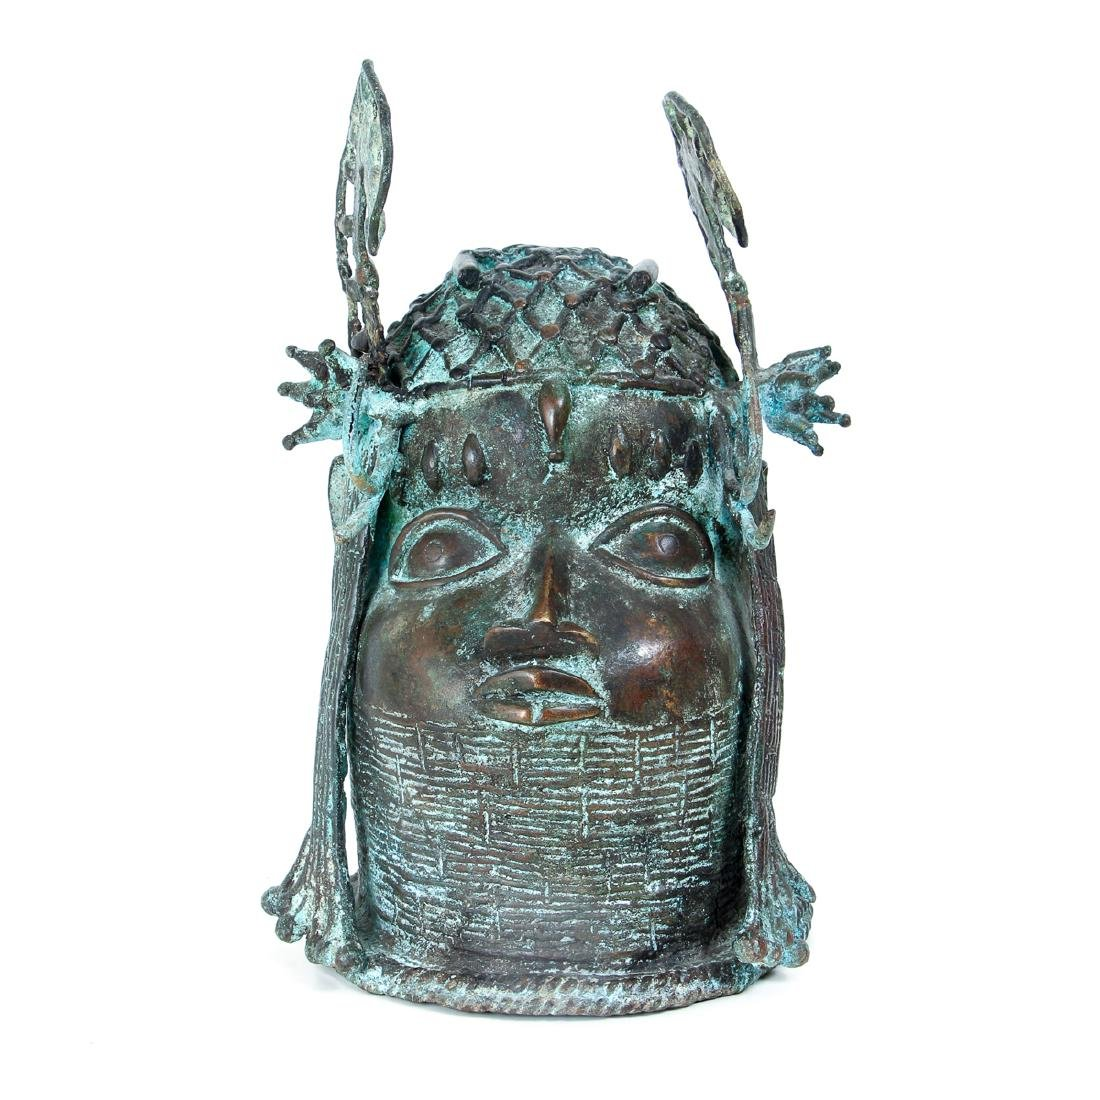 Edo Queen brass or bronze cast